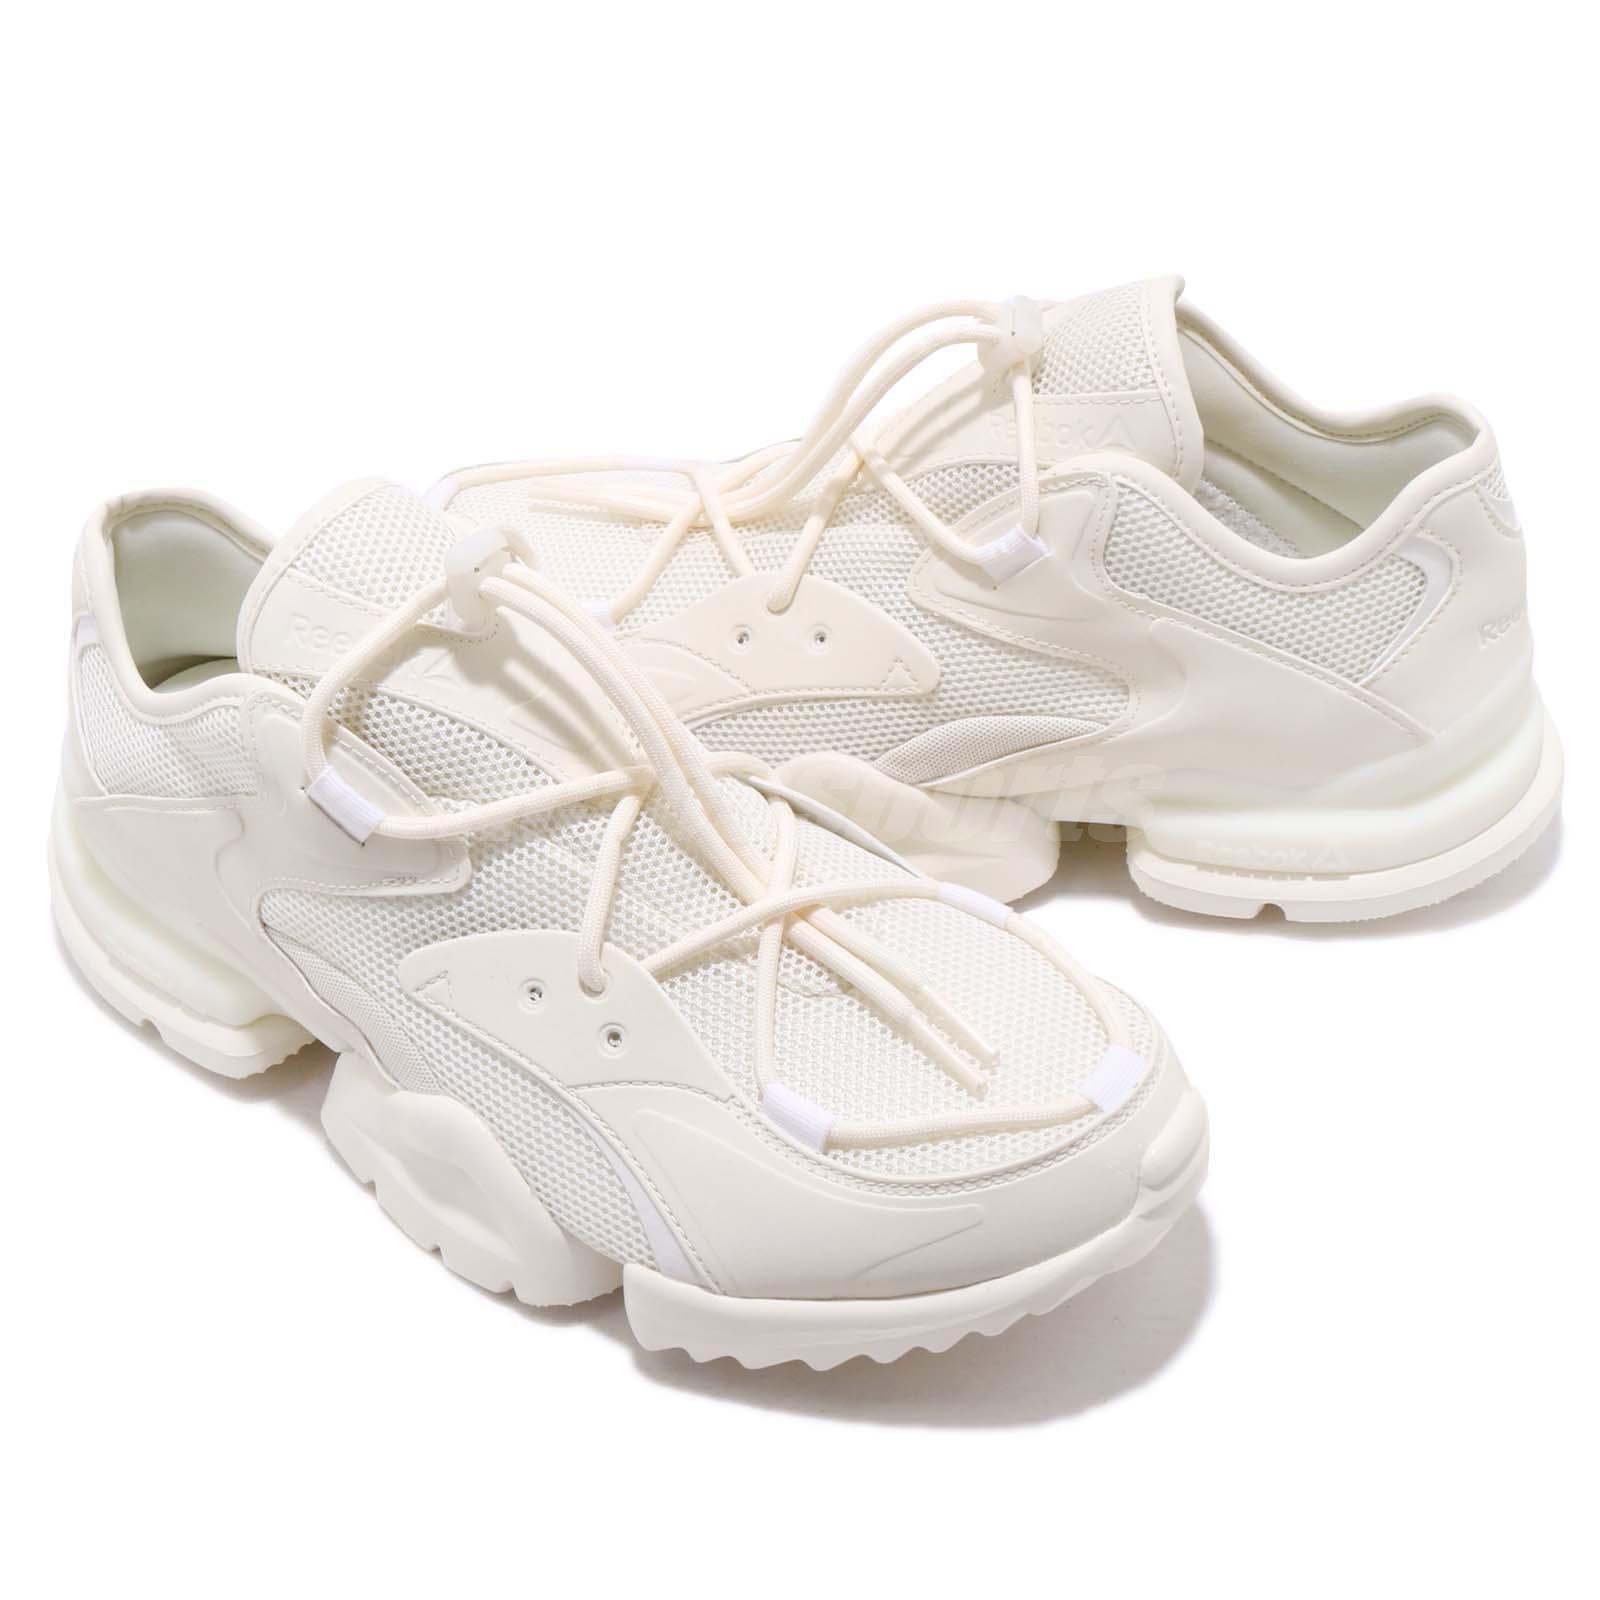 8a5d947b9838ac Reebok RUN R 96 Chalk White Men Running Daddy Chunky Shoes Sneakers ...